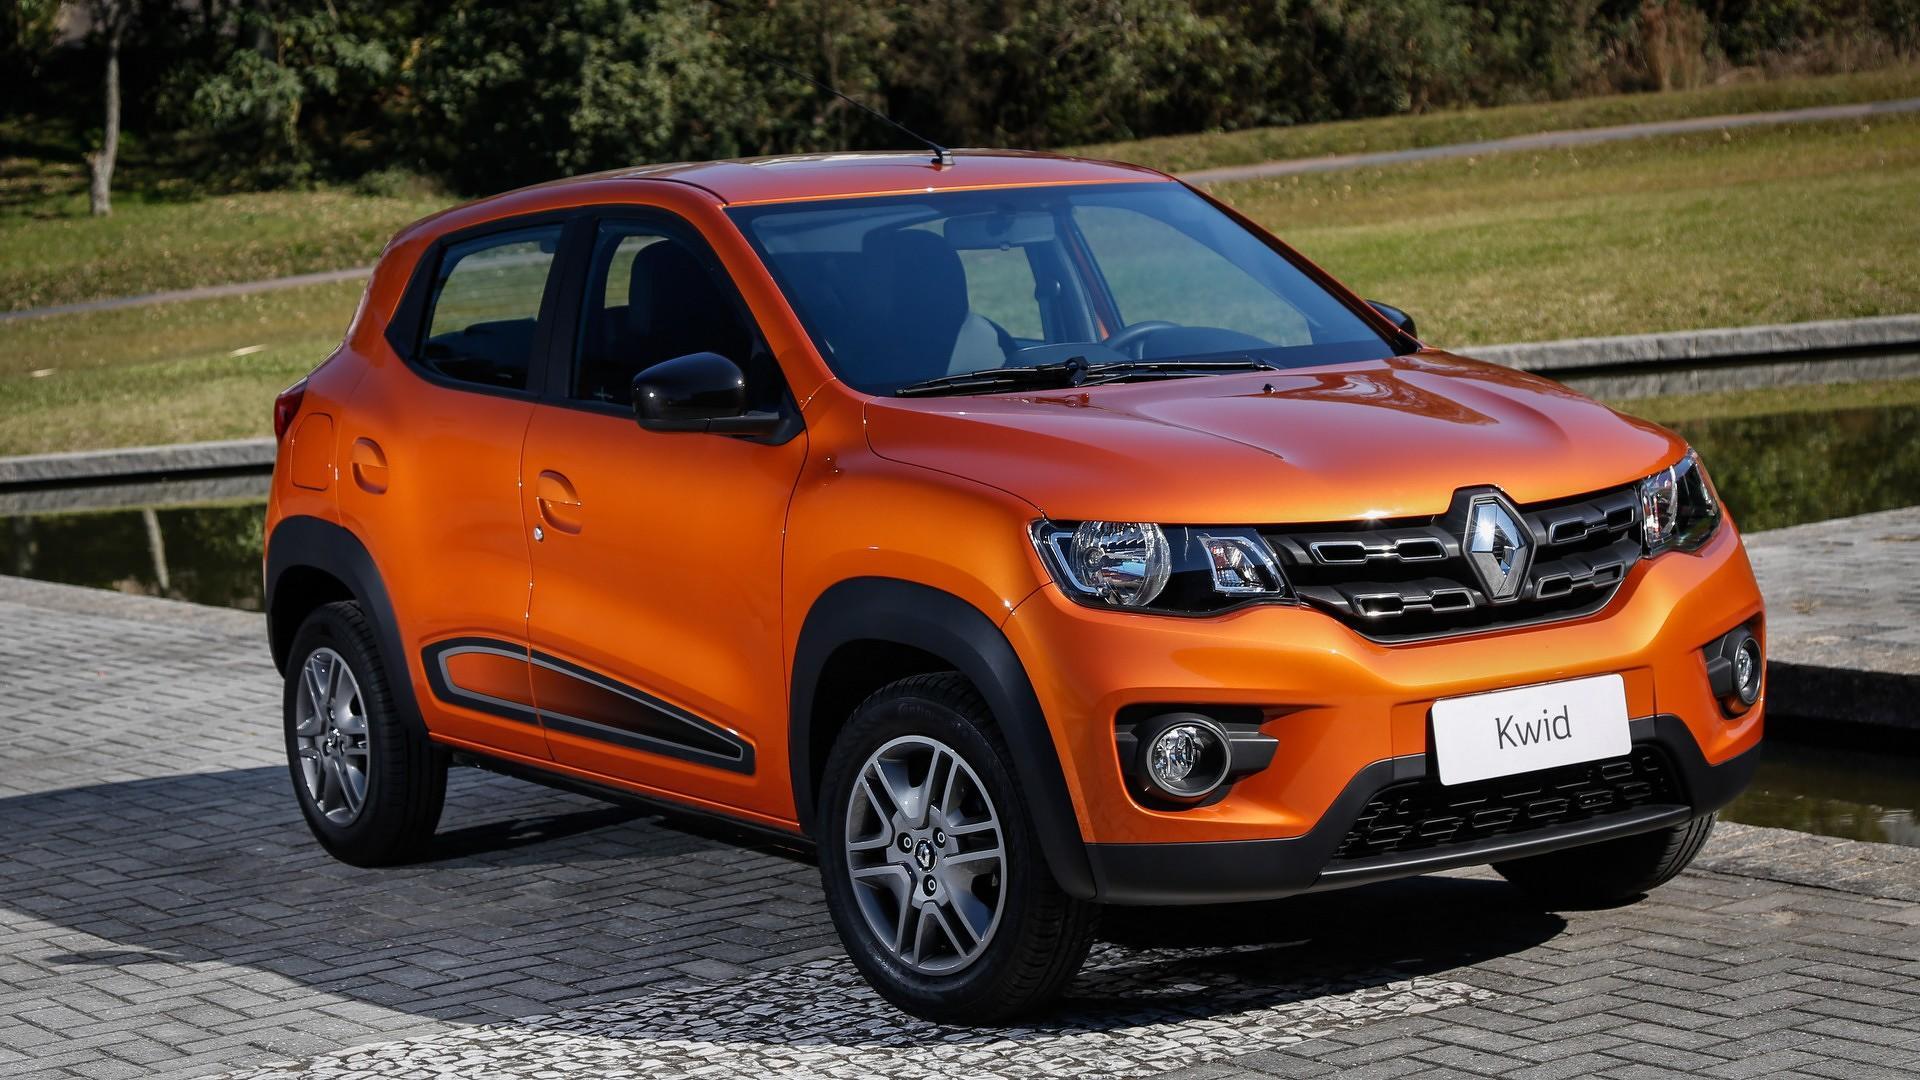 Foto: La Imagem/Renault